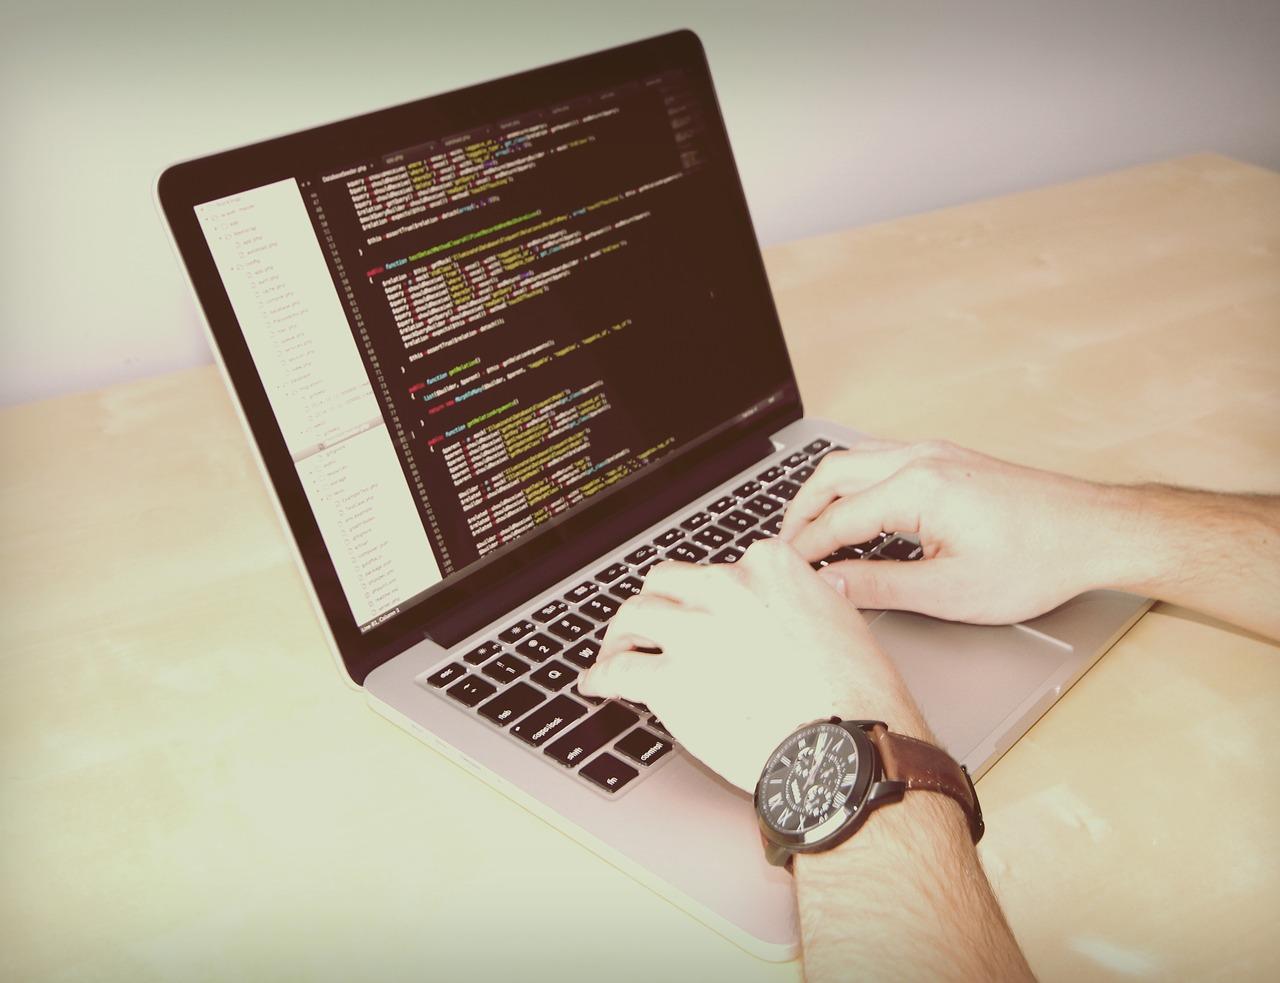 AI for coding company Diffblue Raises $22 Million